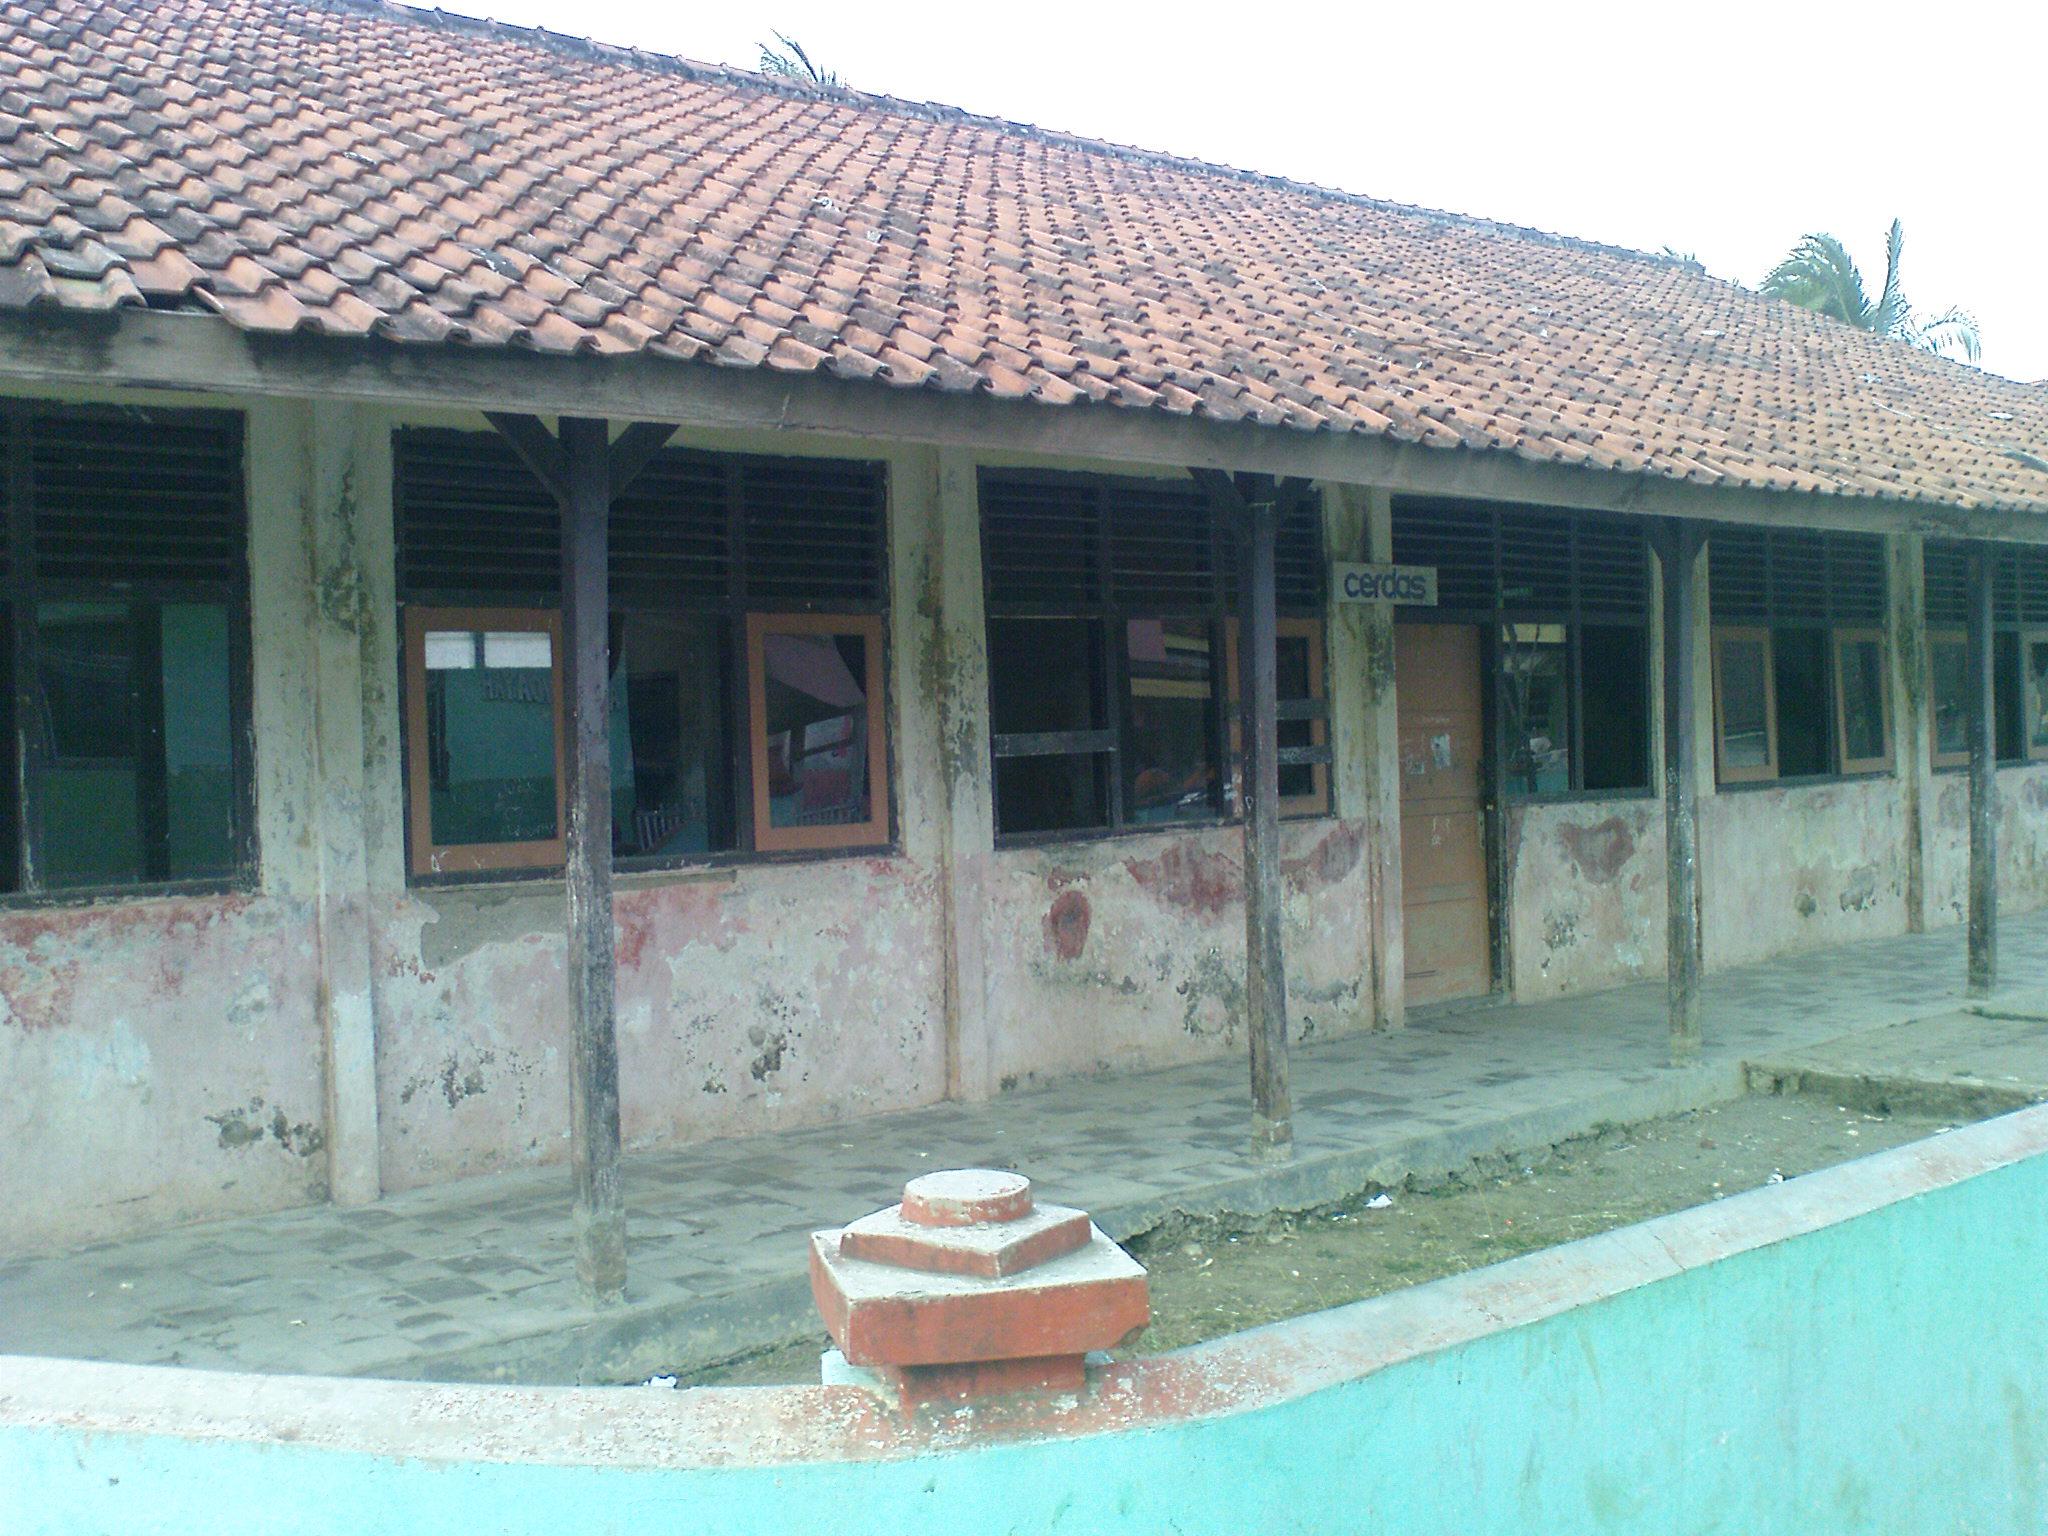 Sekolah Dasar Negeri Desa Ujung Gagak Kampung Laut Cilacap